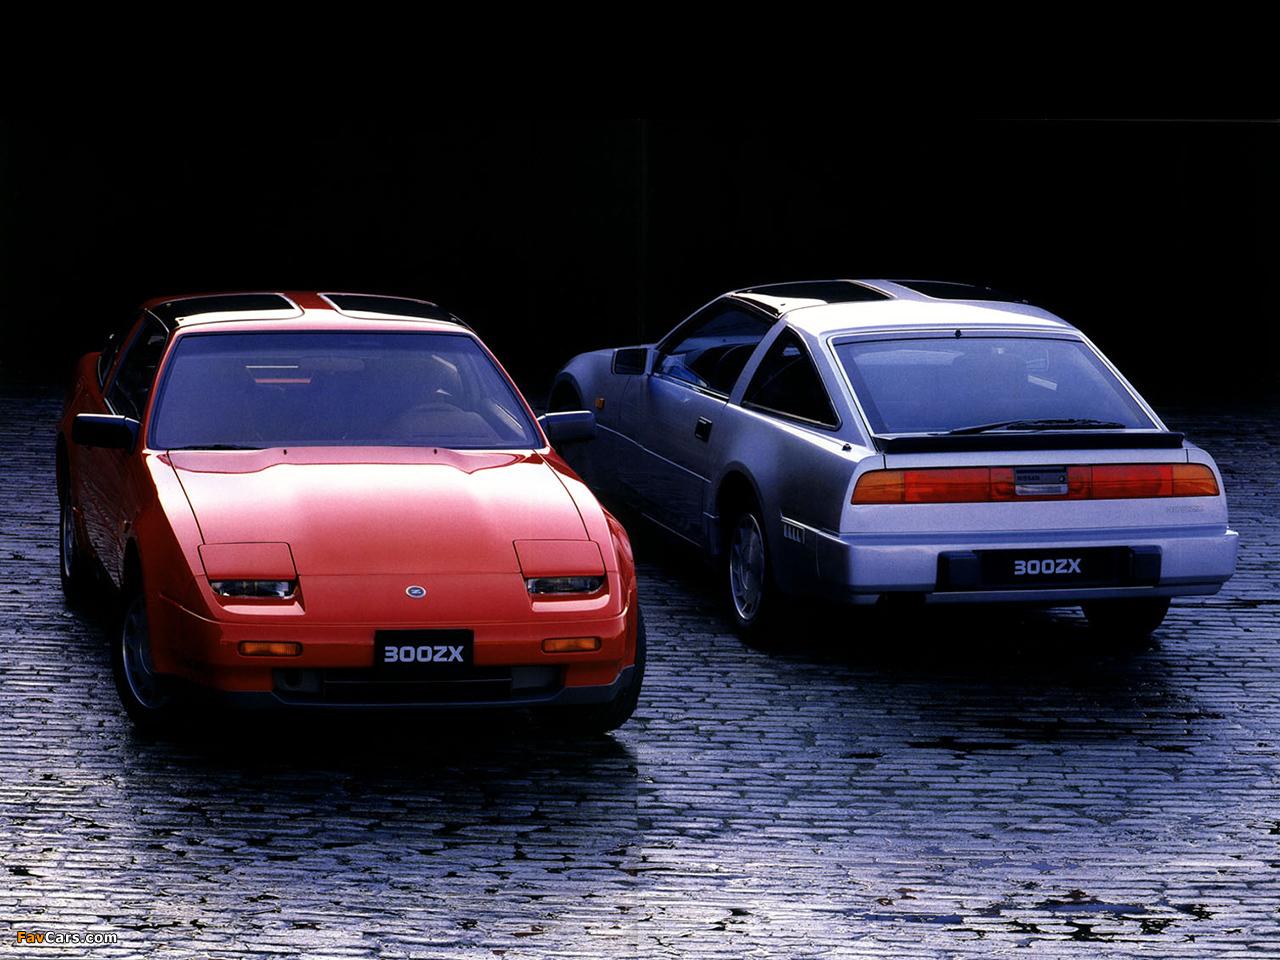 Nissan 300ZX Z31 198389 wallpapers 1280x960 1280x960